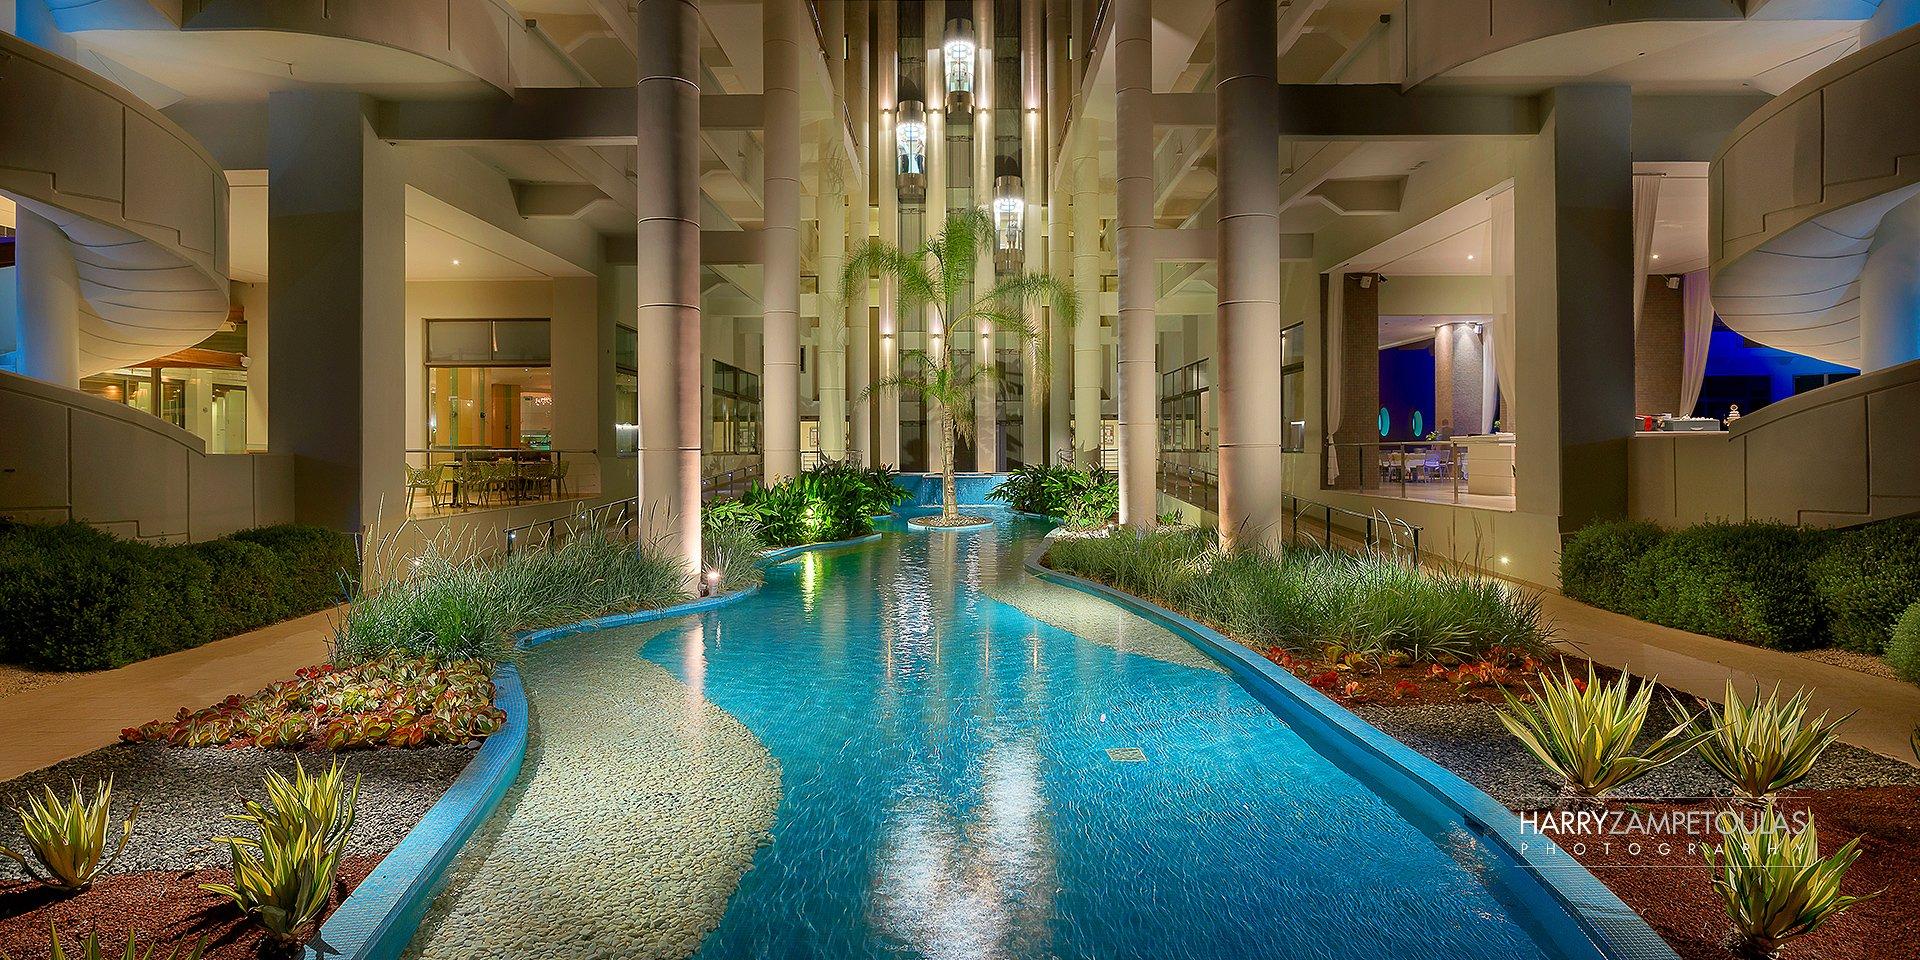 Elevators-1 Φωτογράφιση Ξενοδοχείων, καταλυμάτων, Villas. Google Street View Trusted Photographer.